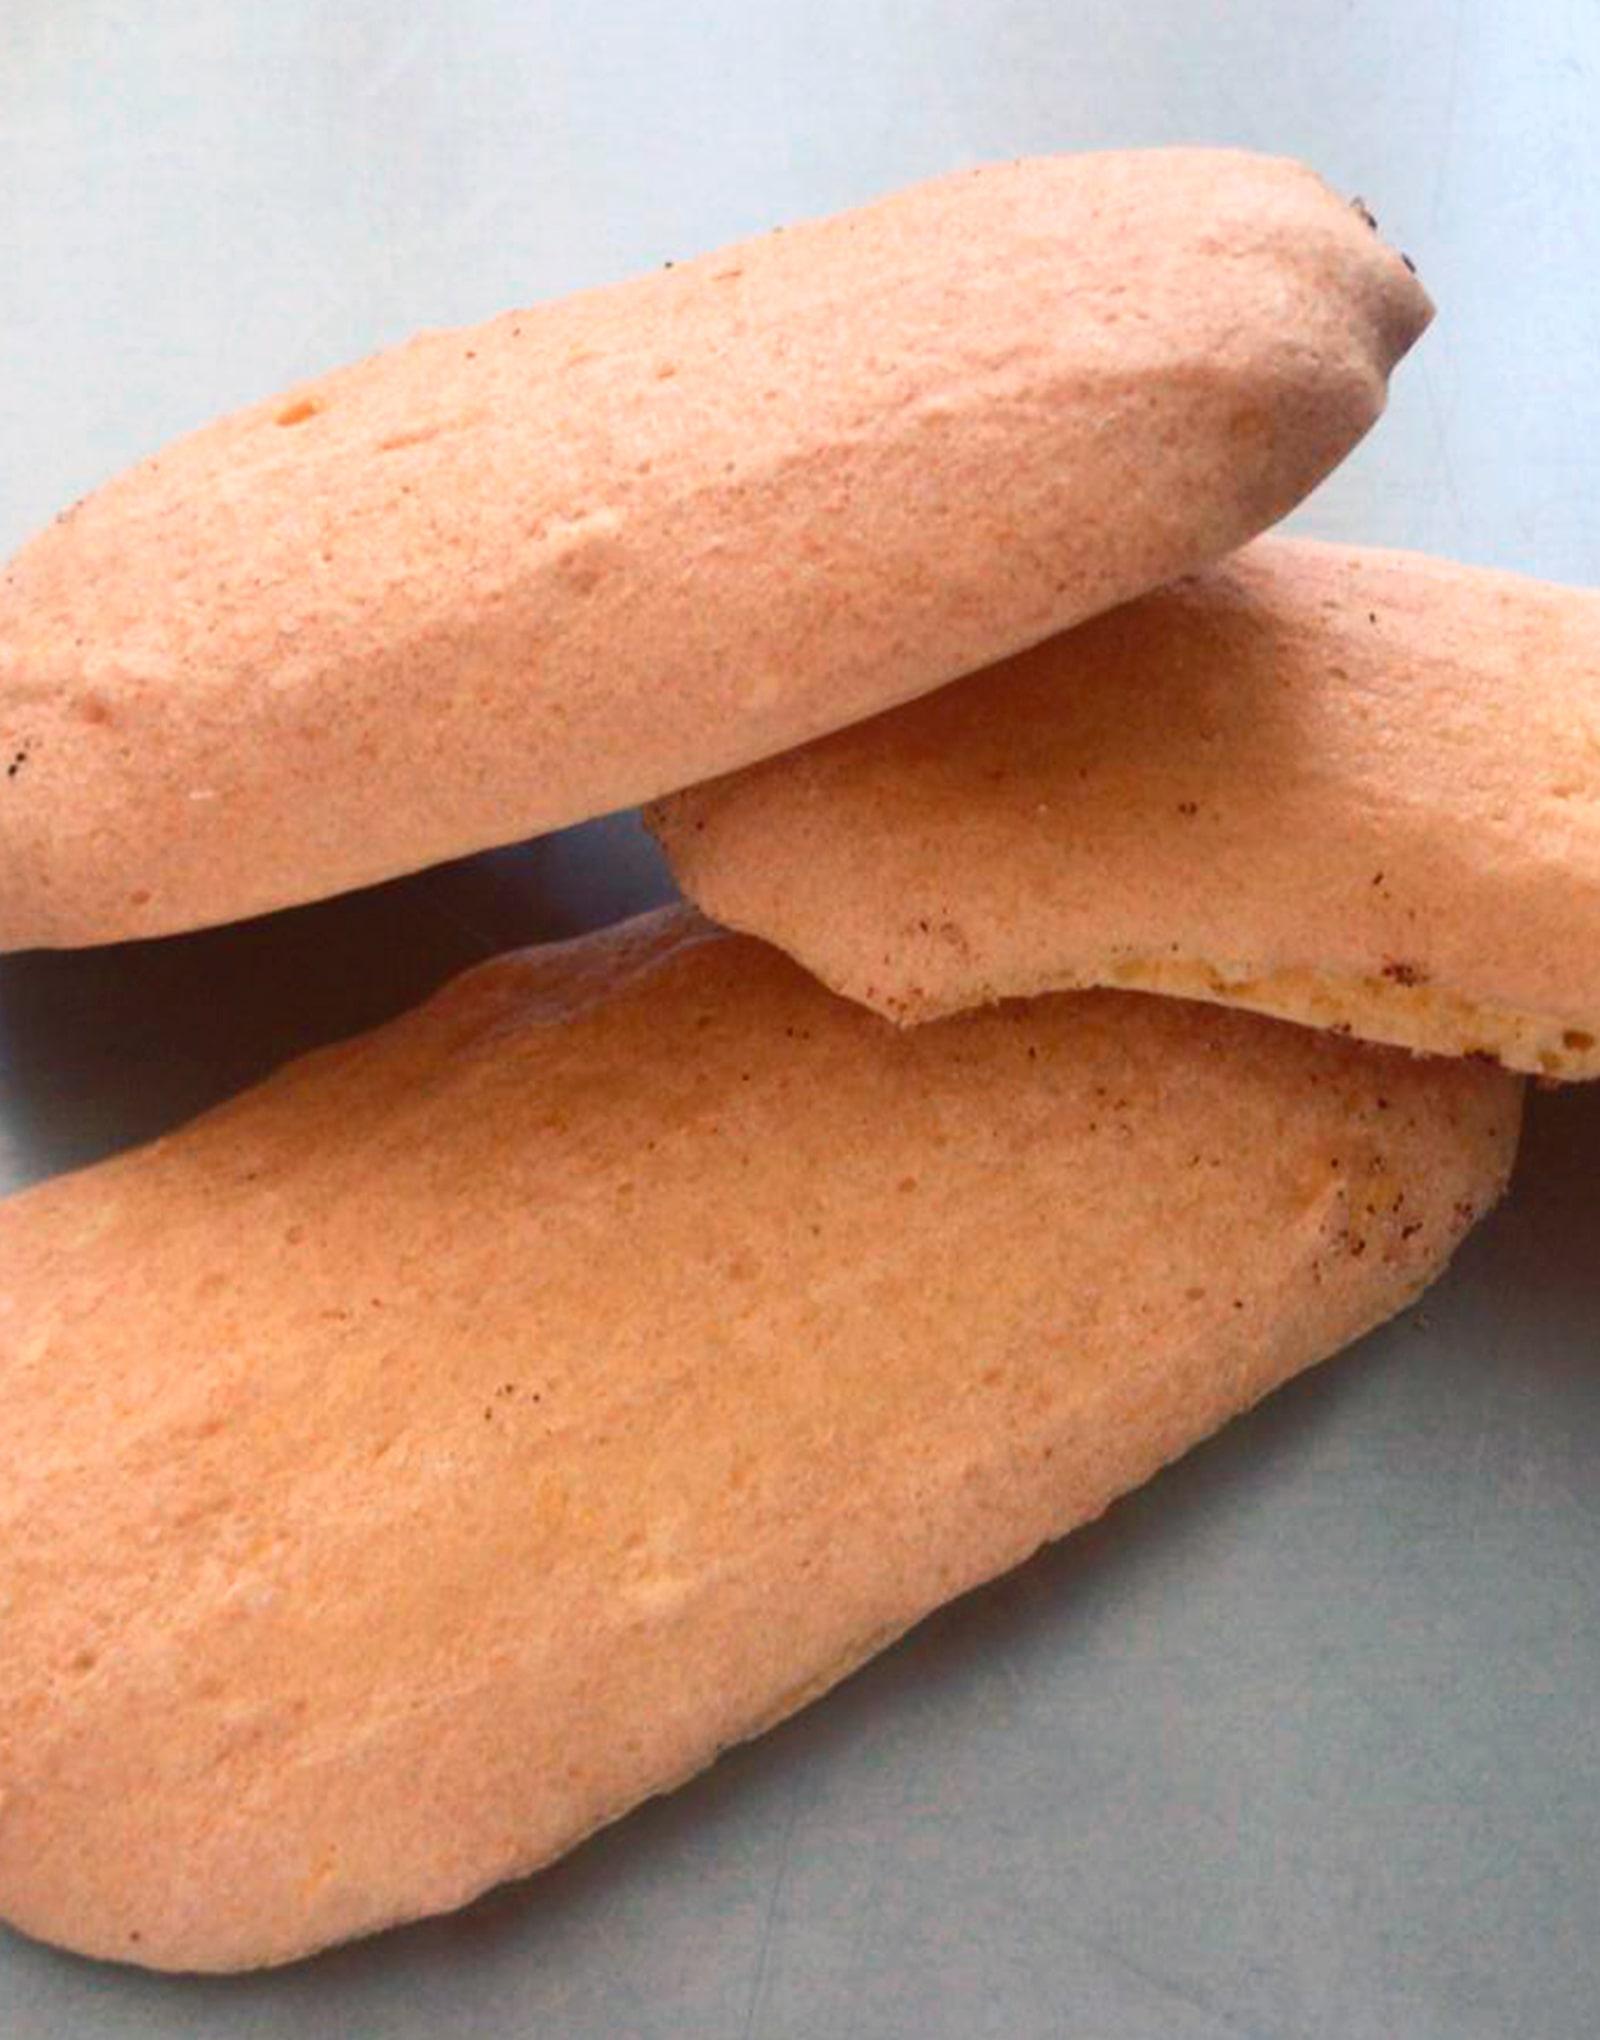 Detalles-Bizcocho-soletilla-Caserissima-sin-gluten-Madridejos